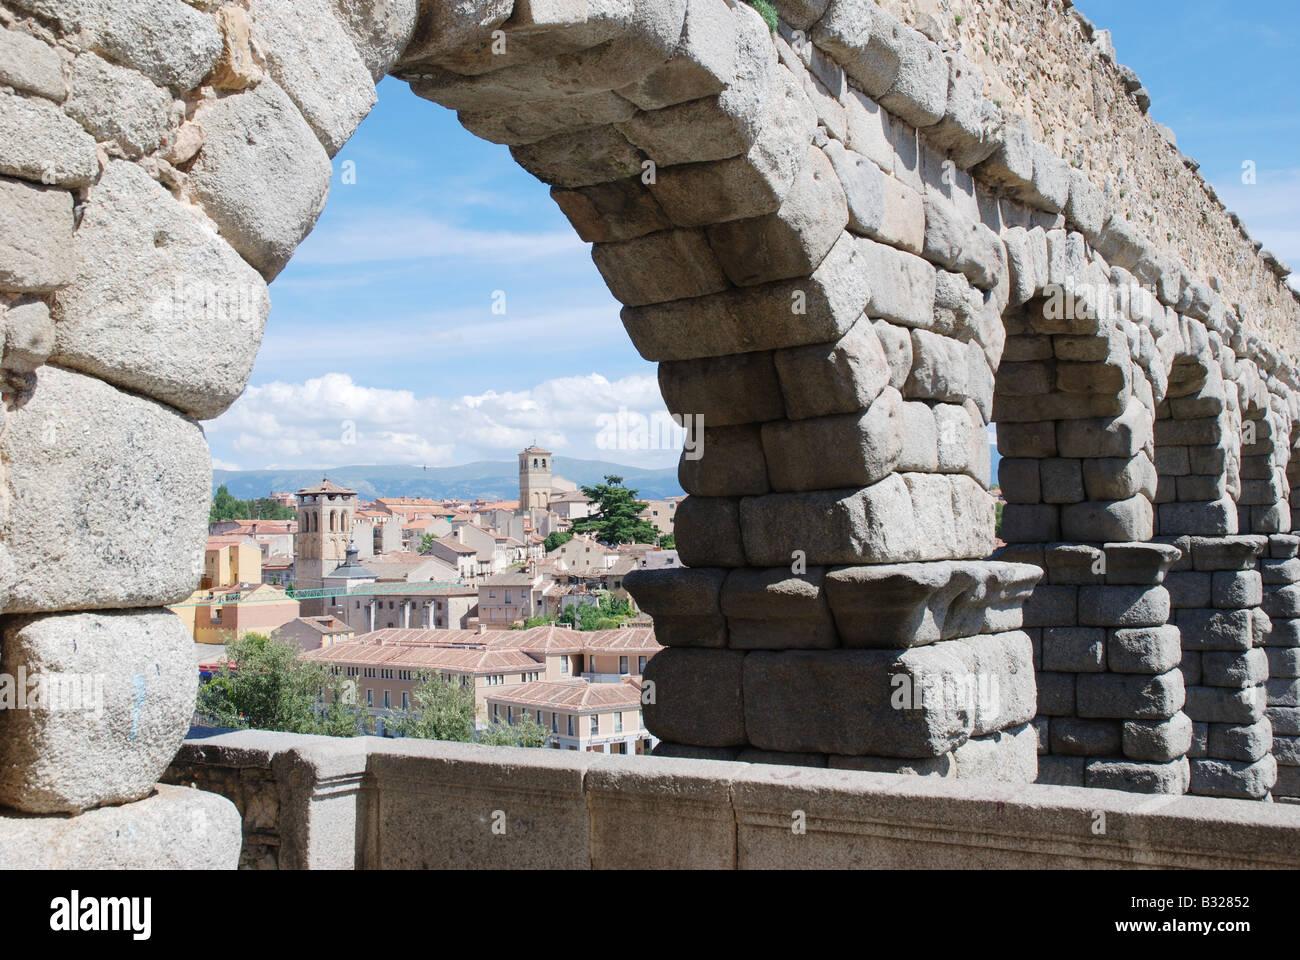 Detail of the Roman Aqueduct. Segovia. Castile-Leon. Spain. - Stock Image